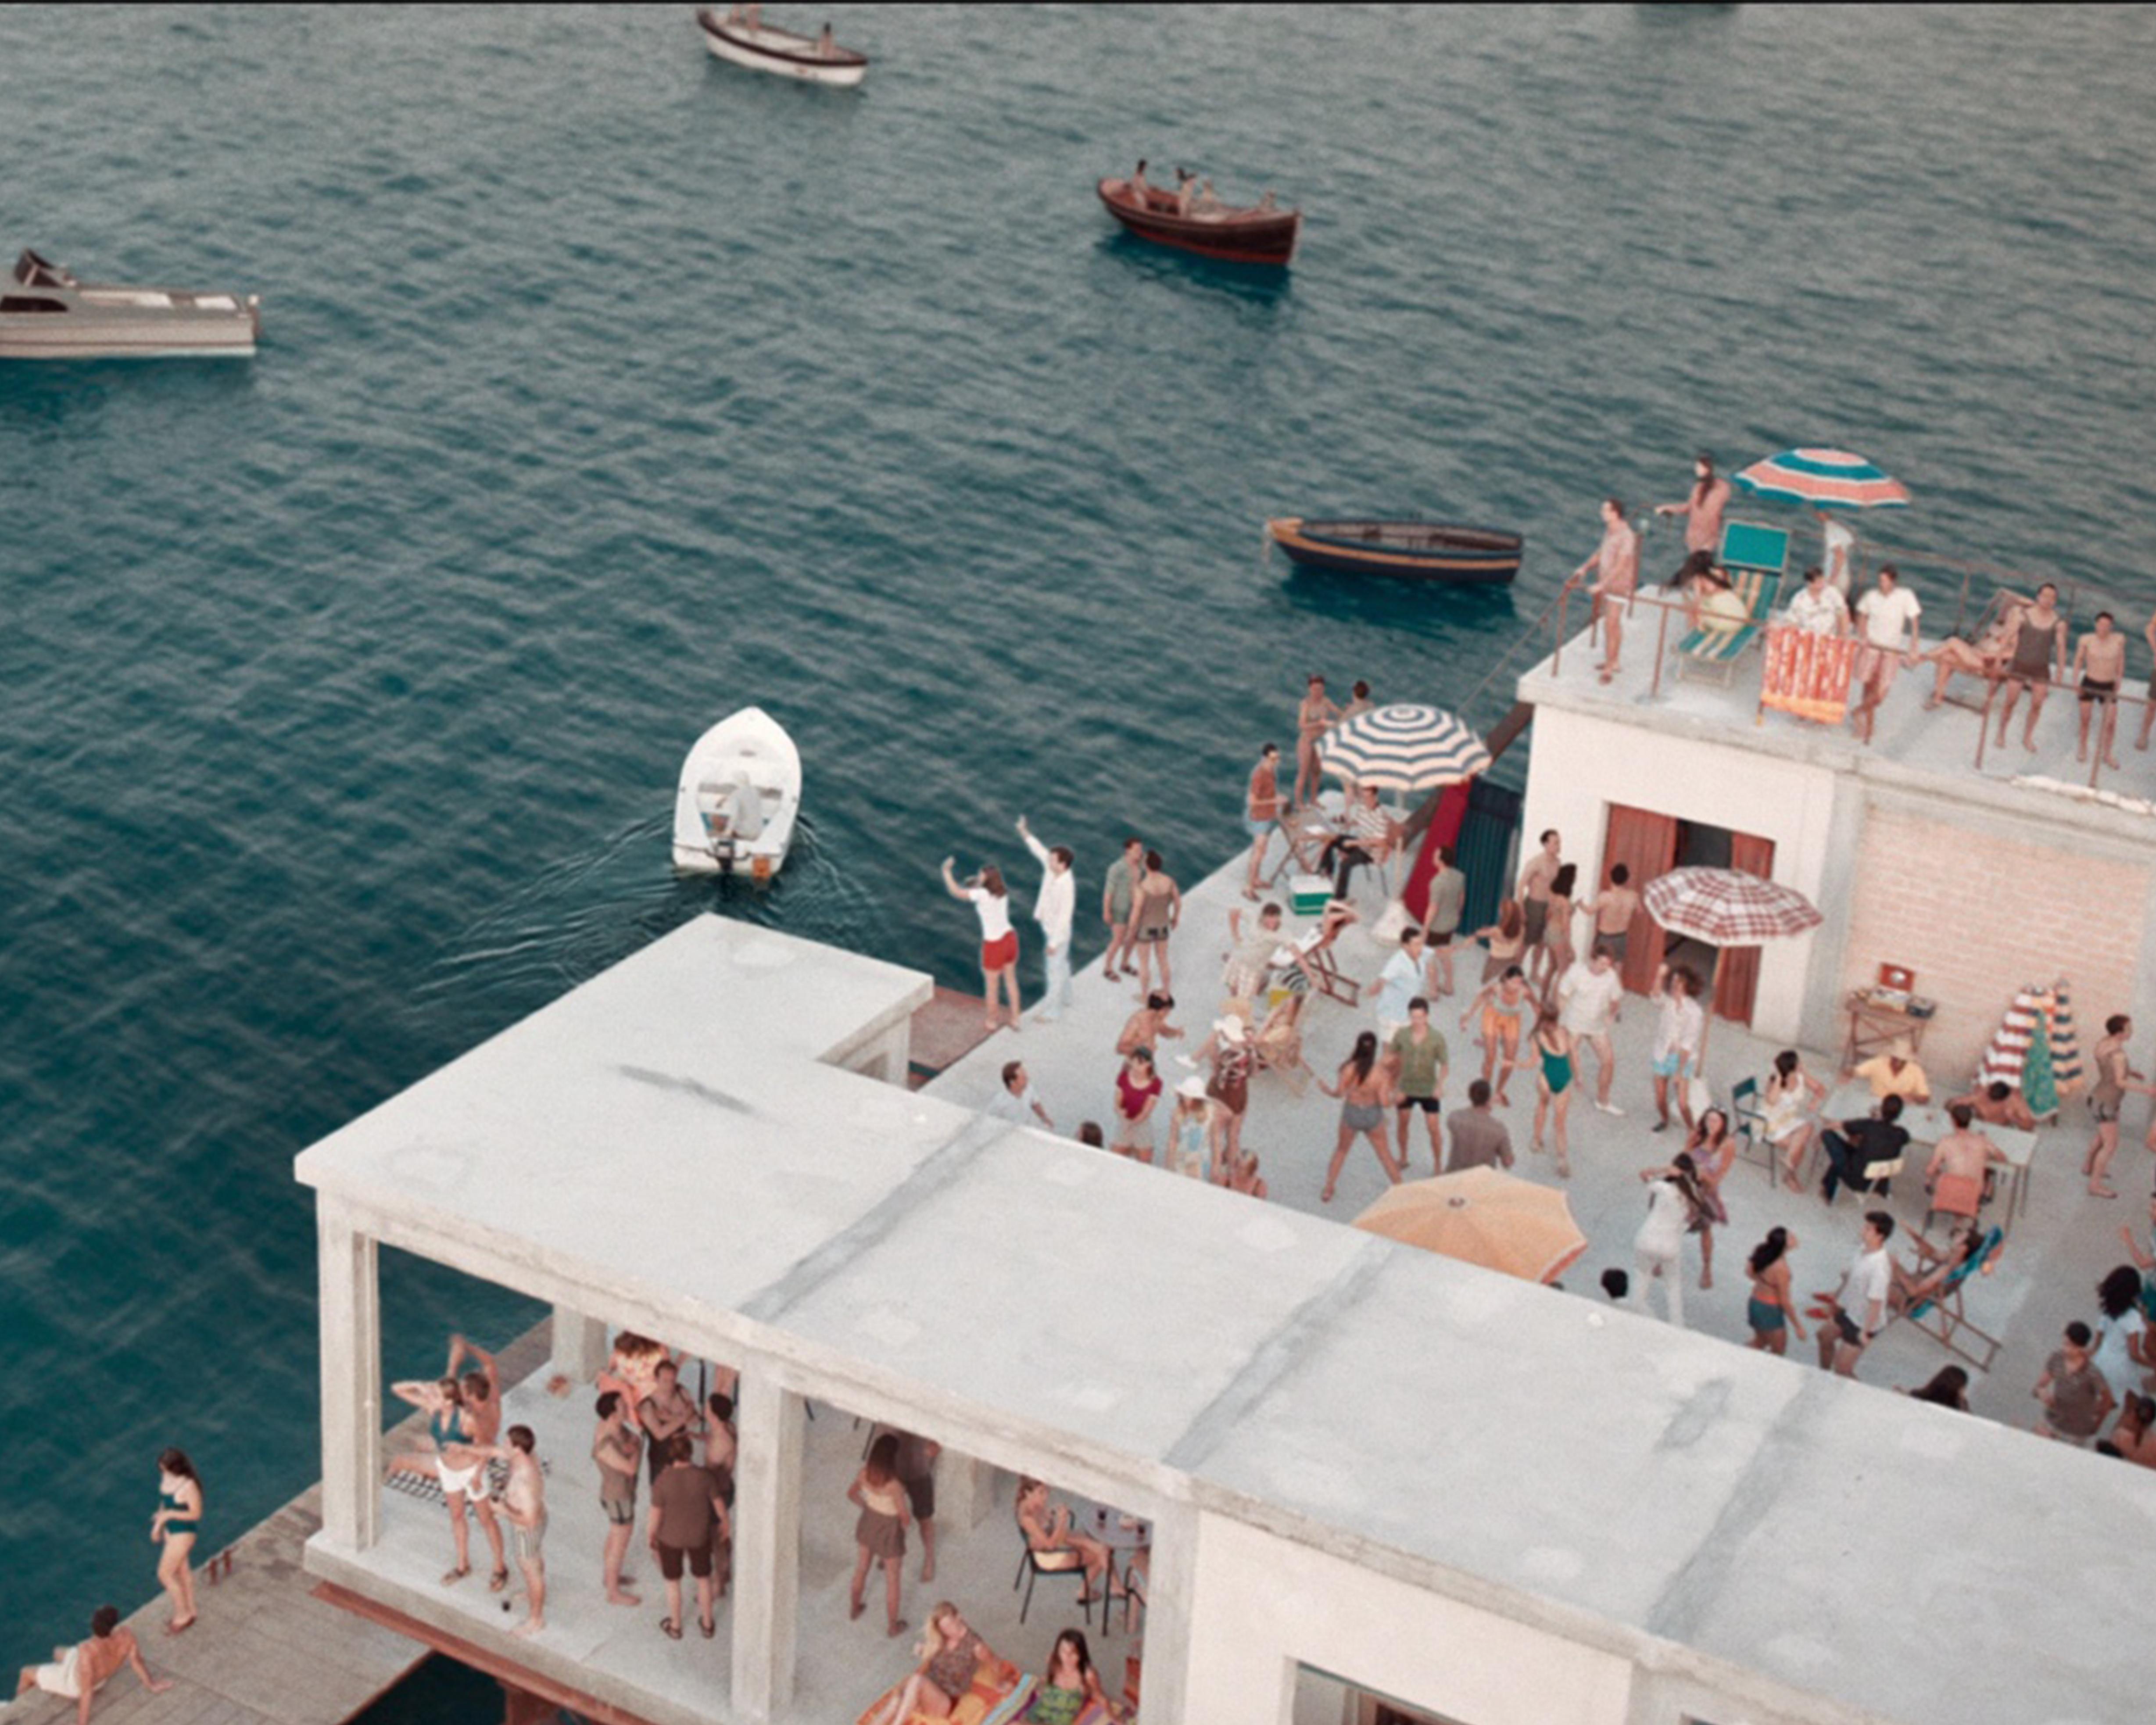 Italian Netflix film chooses Malta for its production